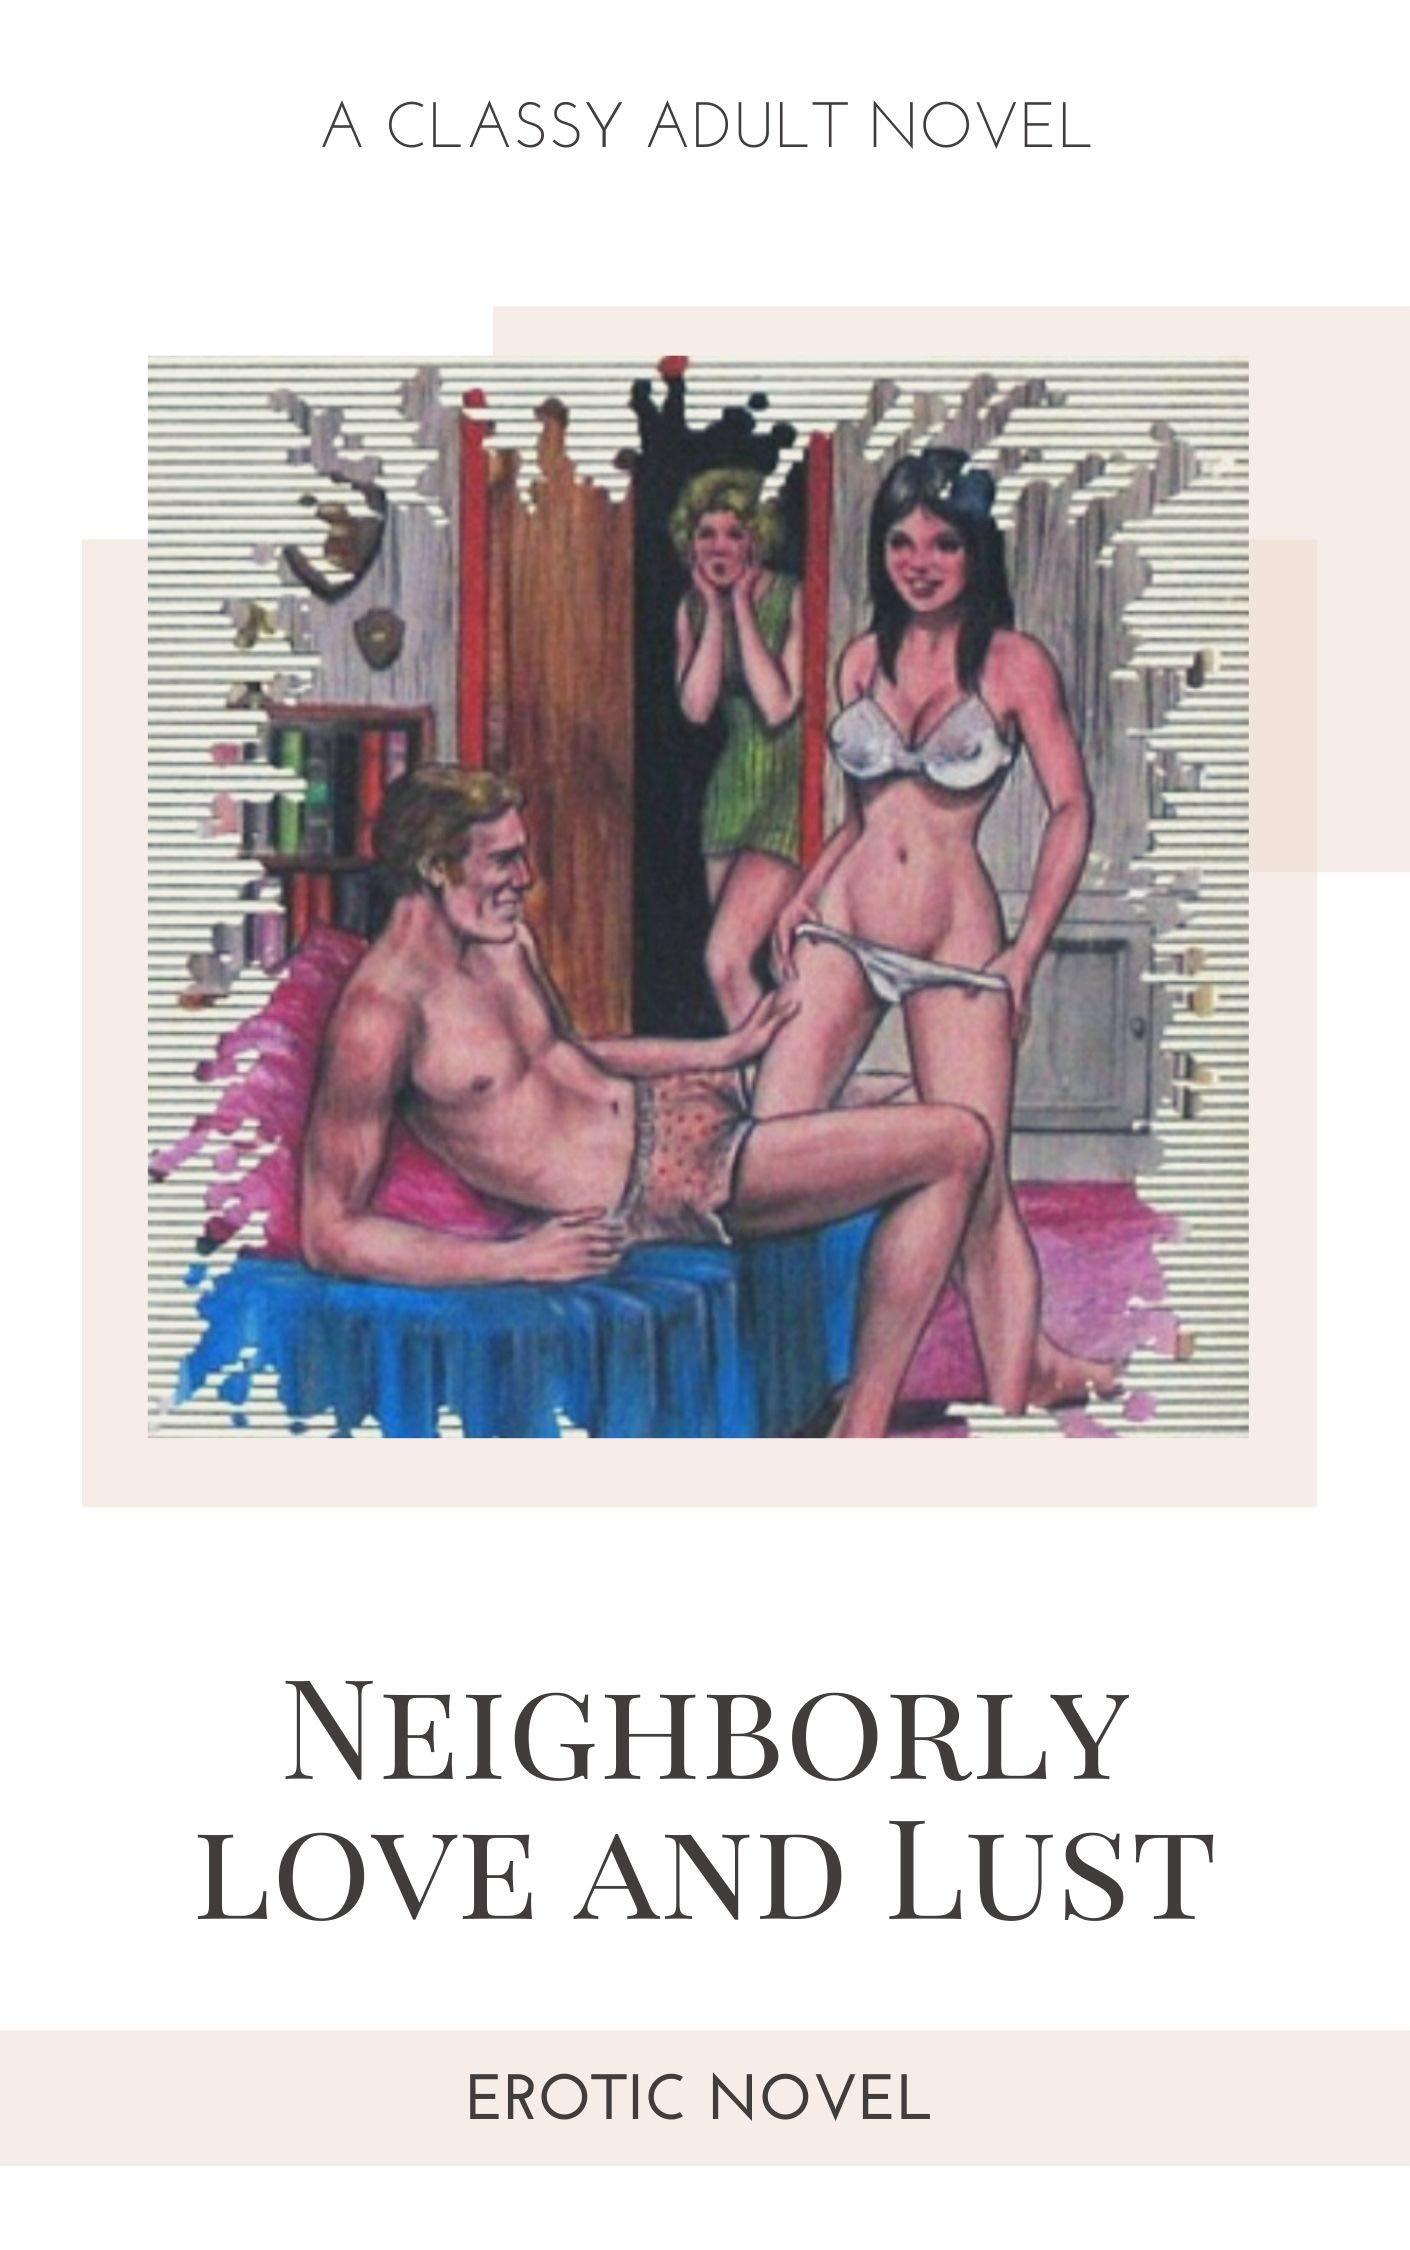 Neighborly love and Lust: Erotic Novel